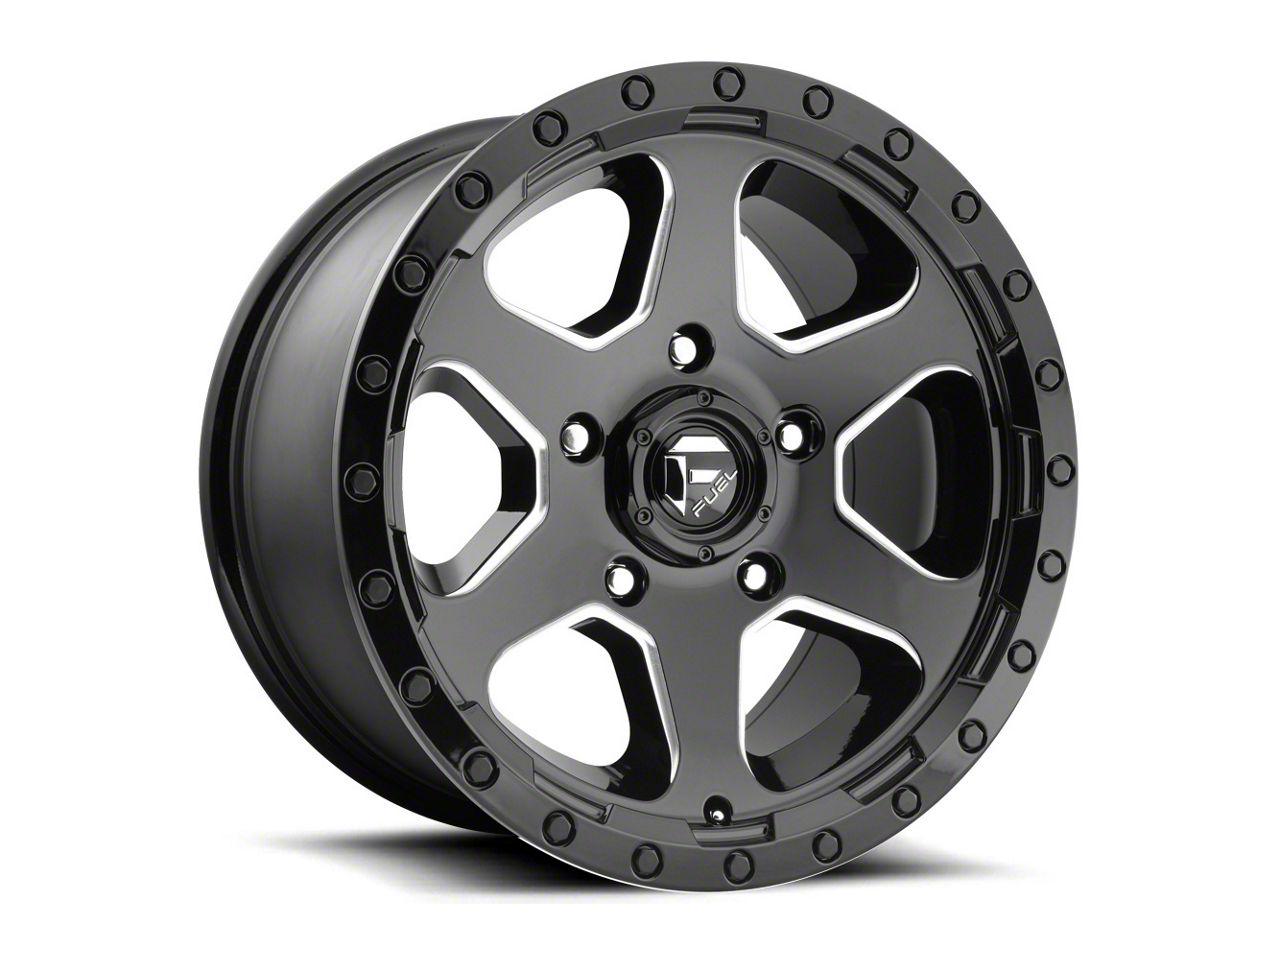 Fuel Wheels Ripper Gloss Black Milled 6-Lug Wheel - 20x10 (99-18 Silverado 1500)